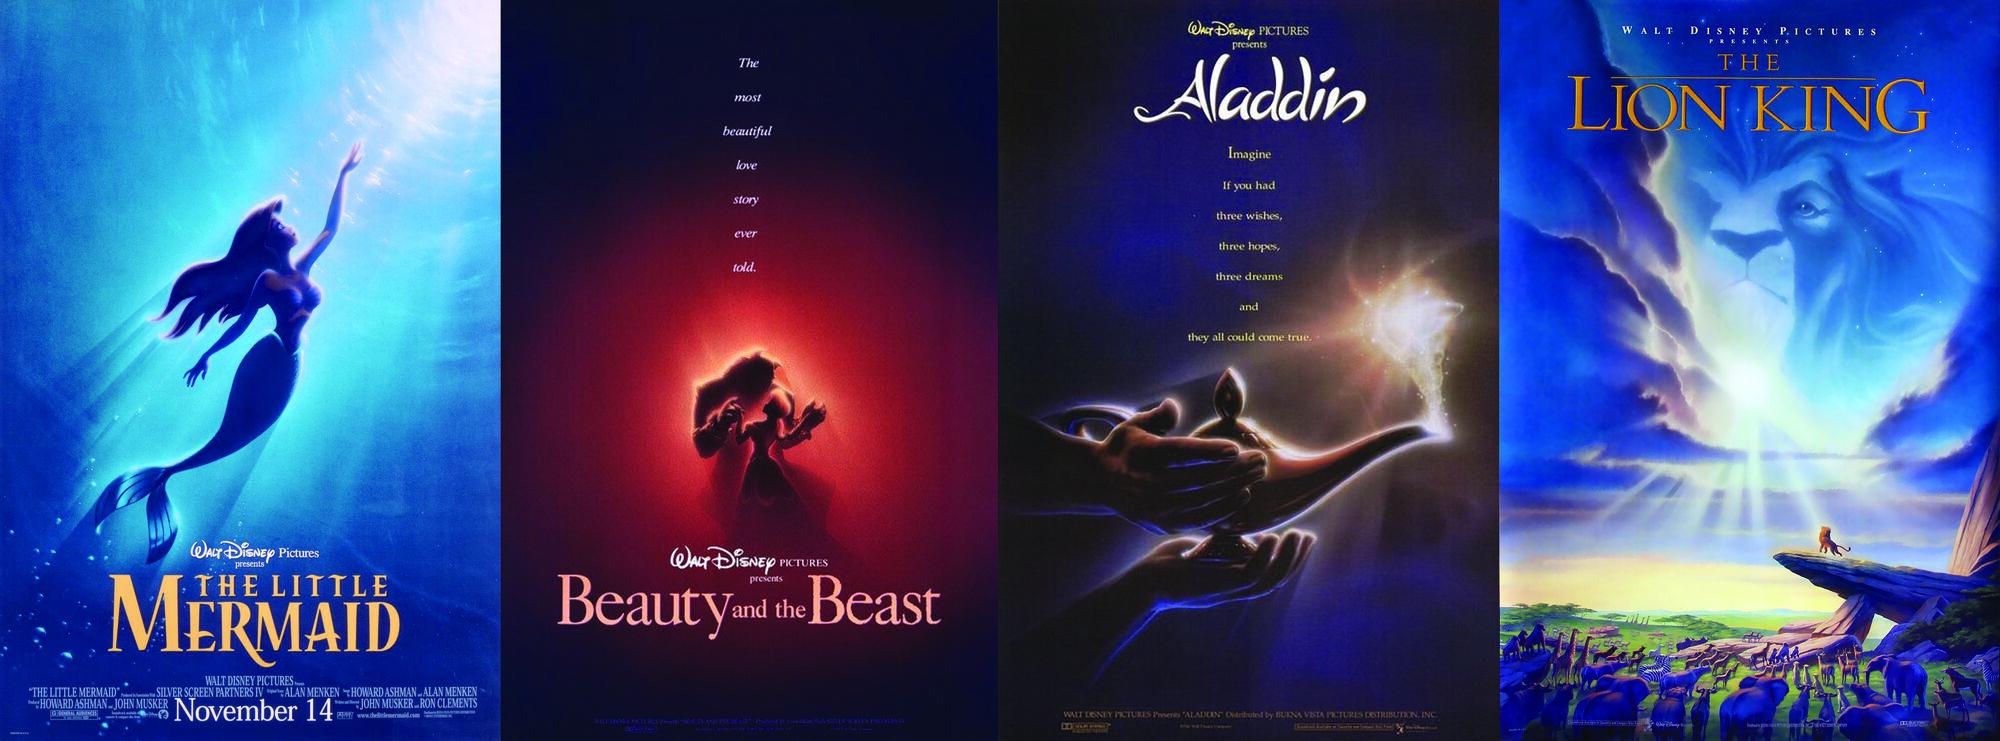 Disney Renaissance Disney Wiki Fandom